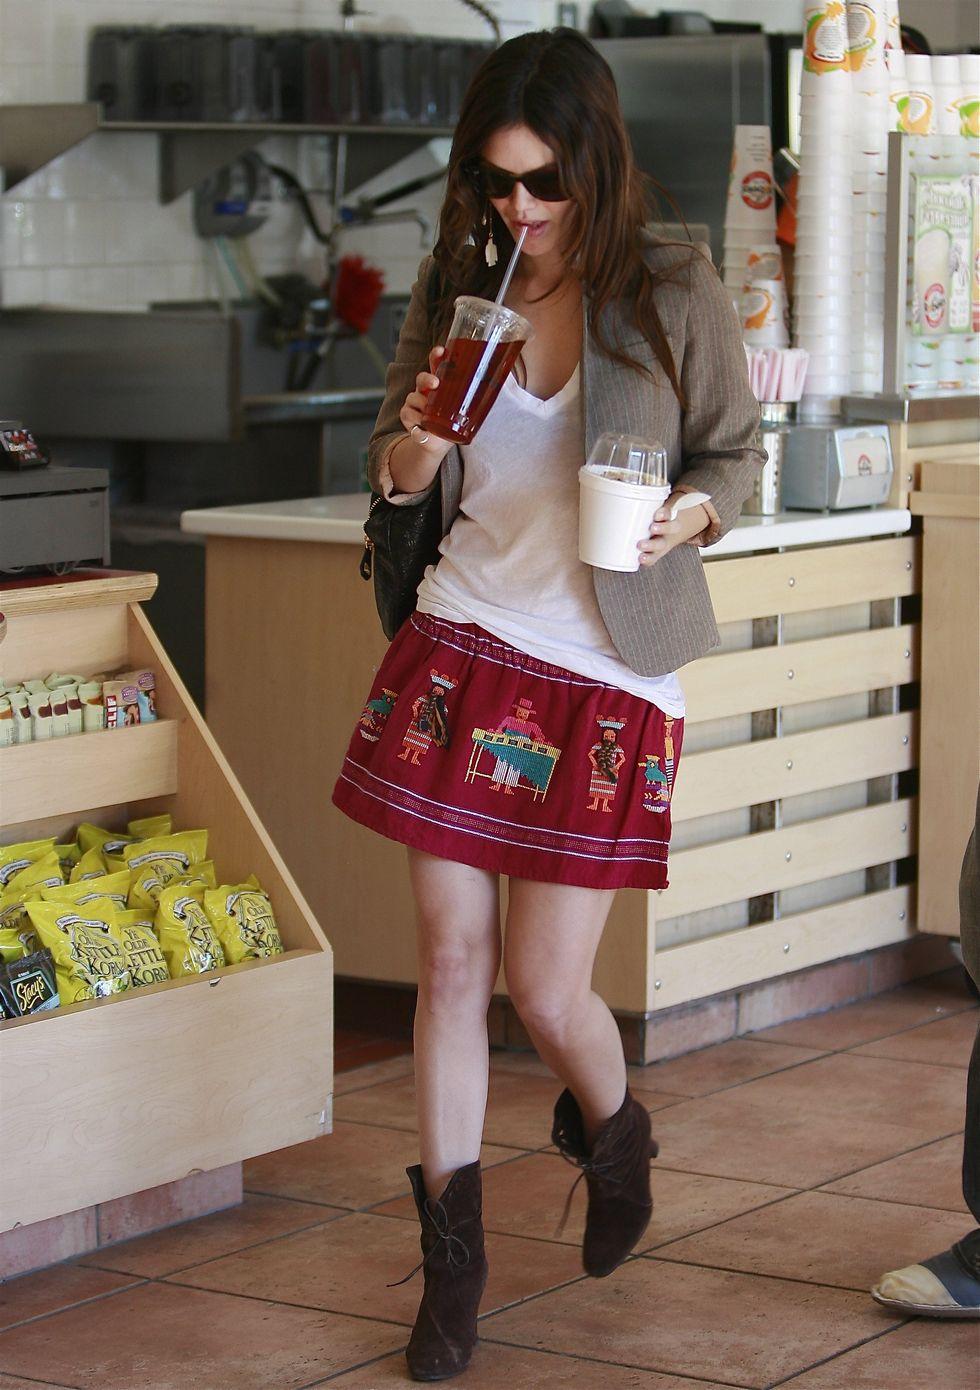 rachel-bilson-leggy-candids-at-alcove-cafe-bakery-in-los-feliz-01